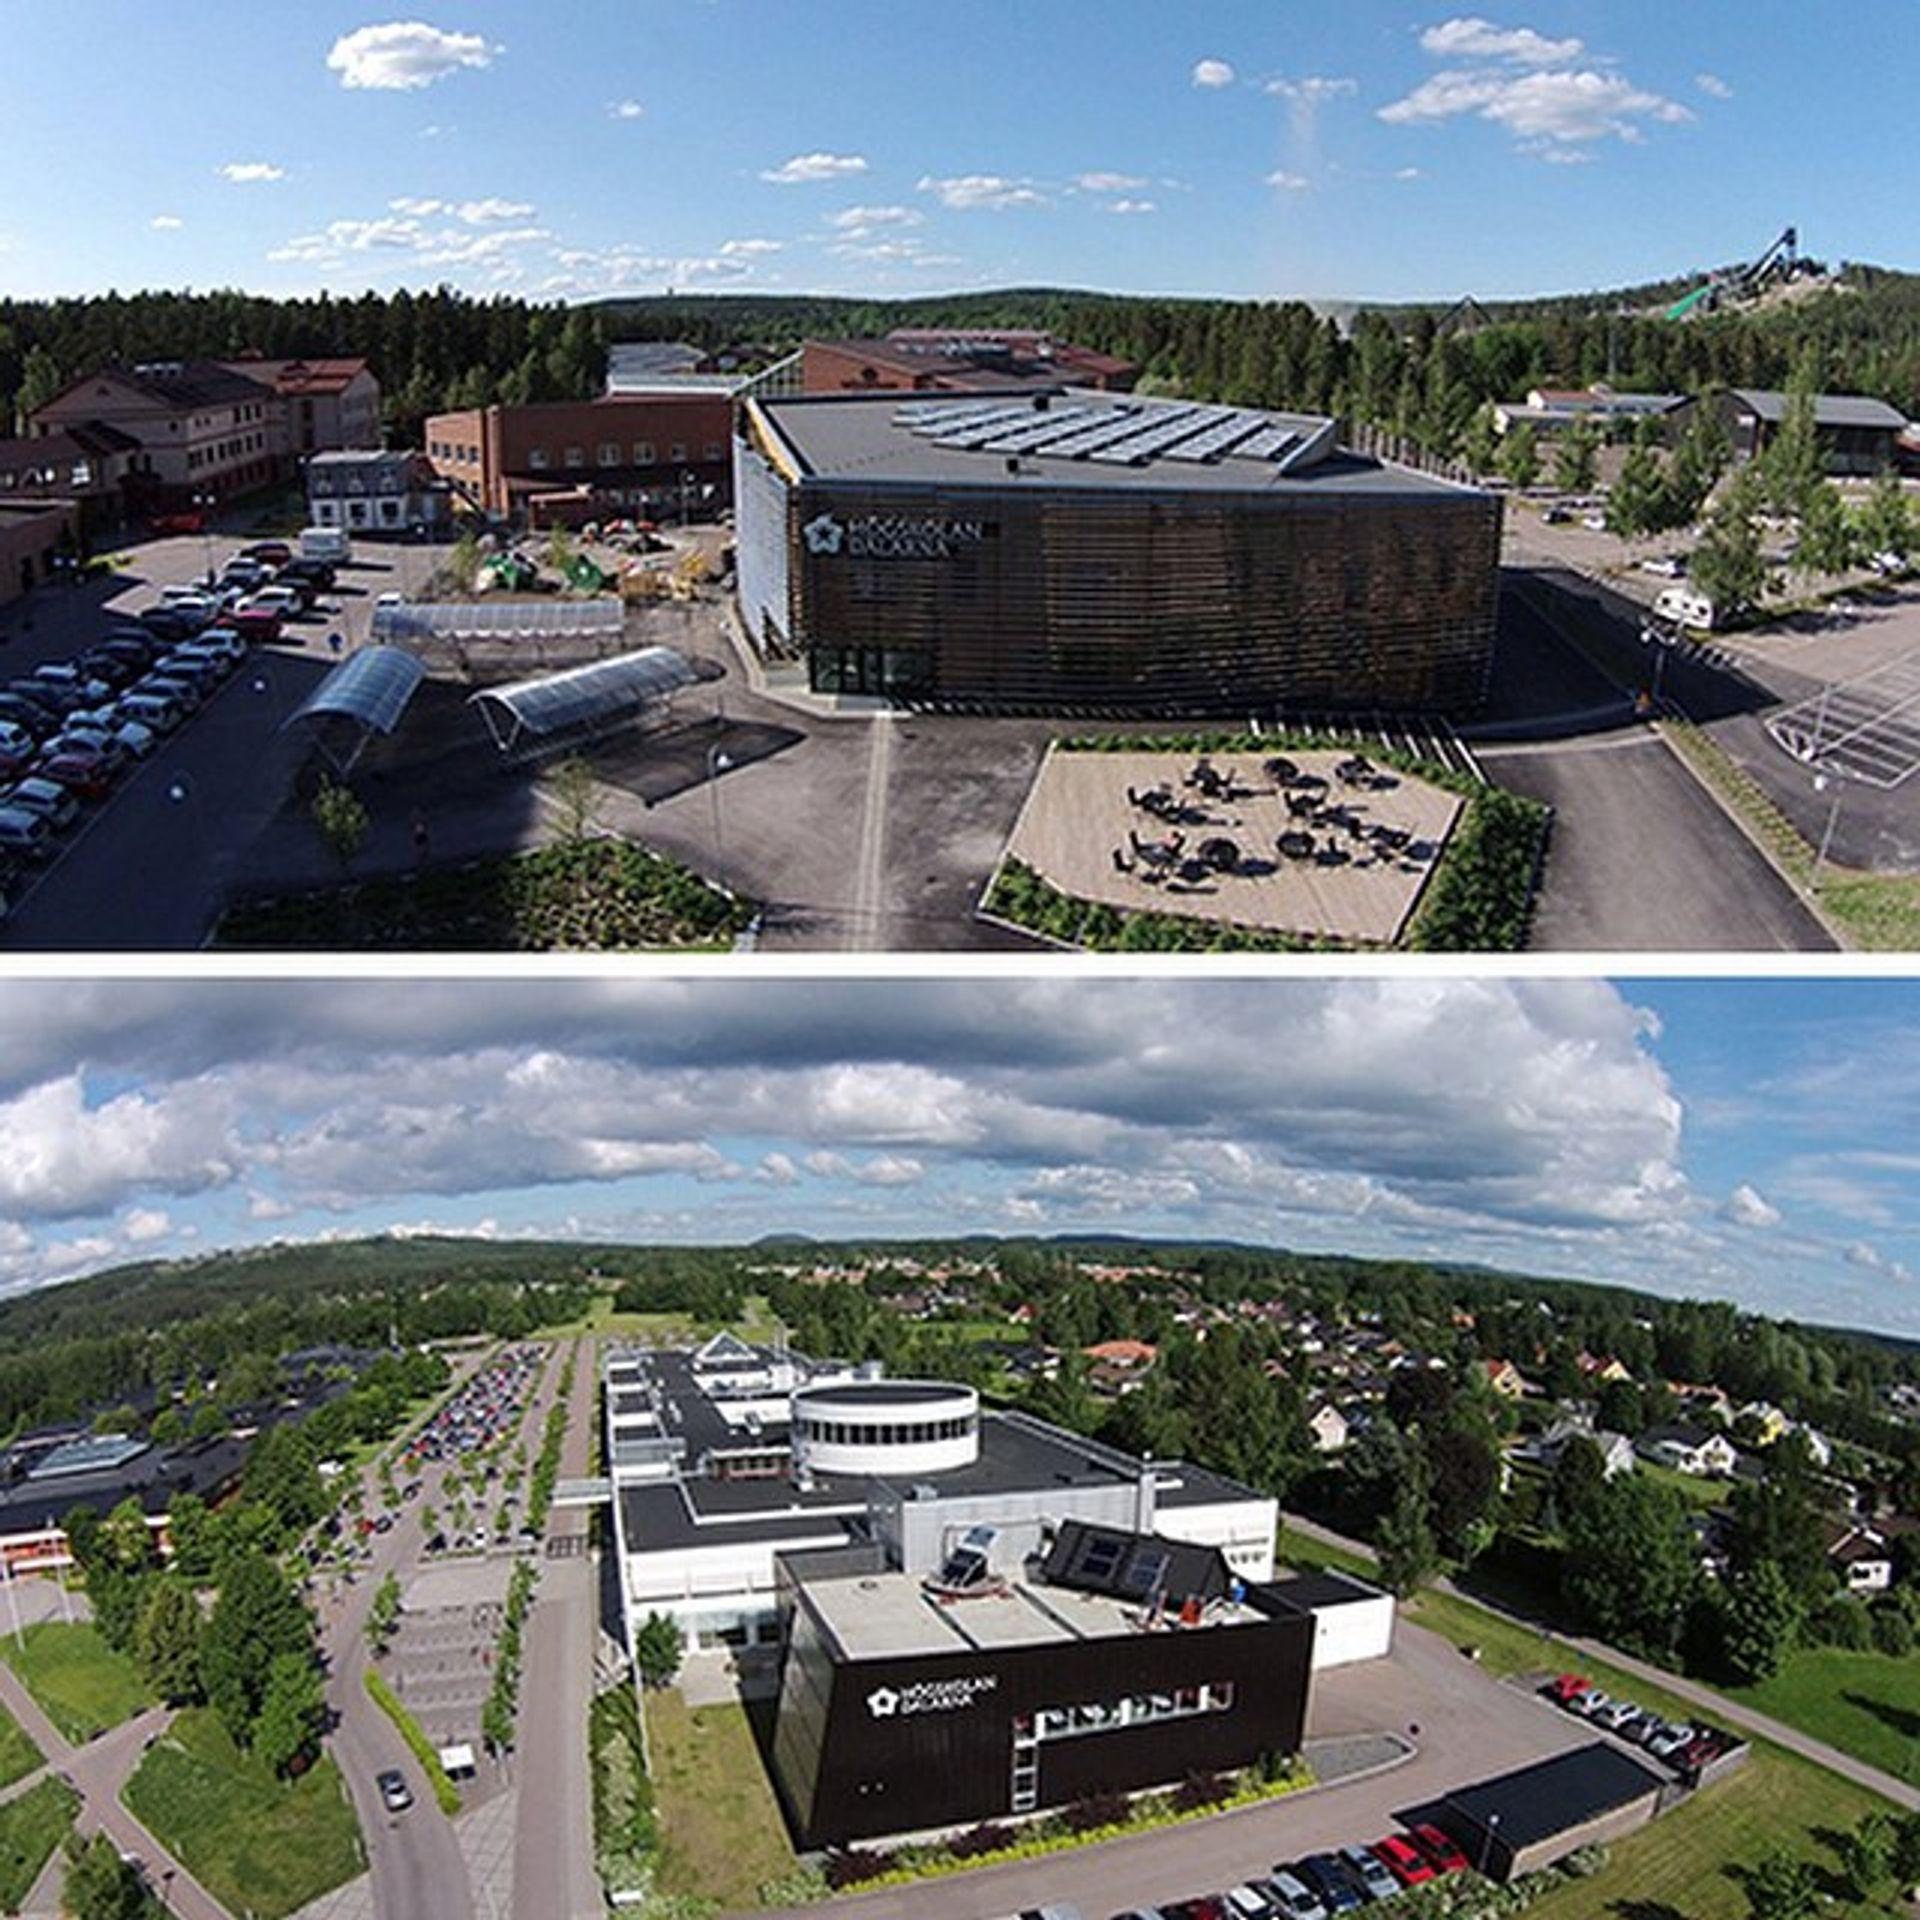 Dalarna University Campus